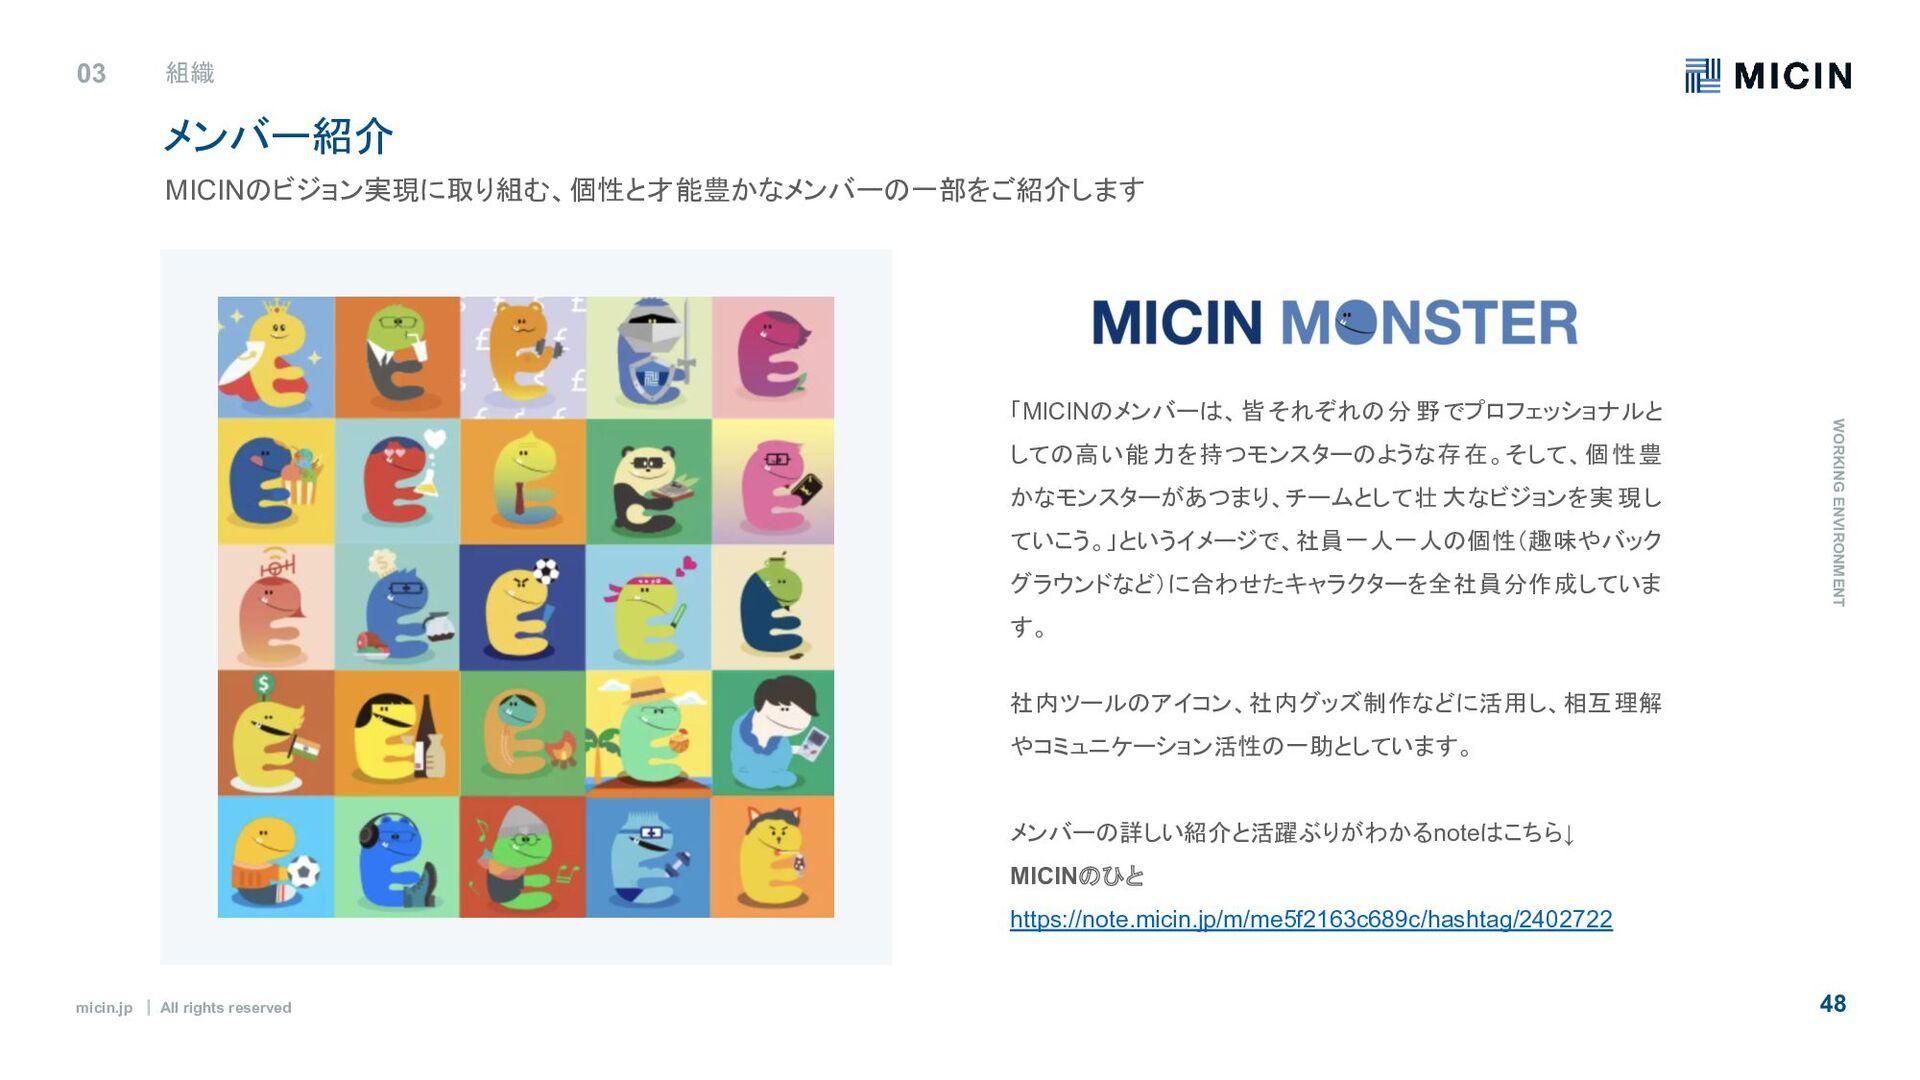 micin.jp ʛ All rights reserved 48 メンバー紹介 03 S.T...